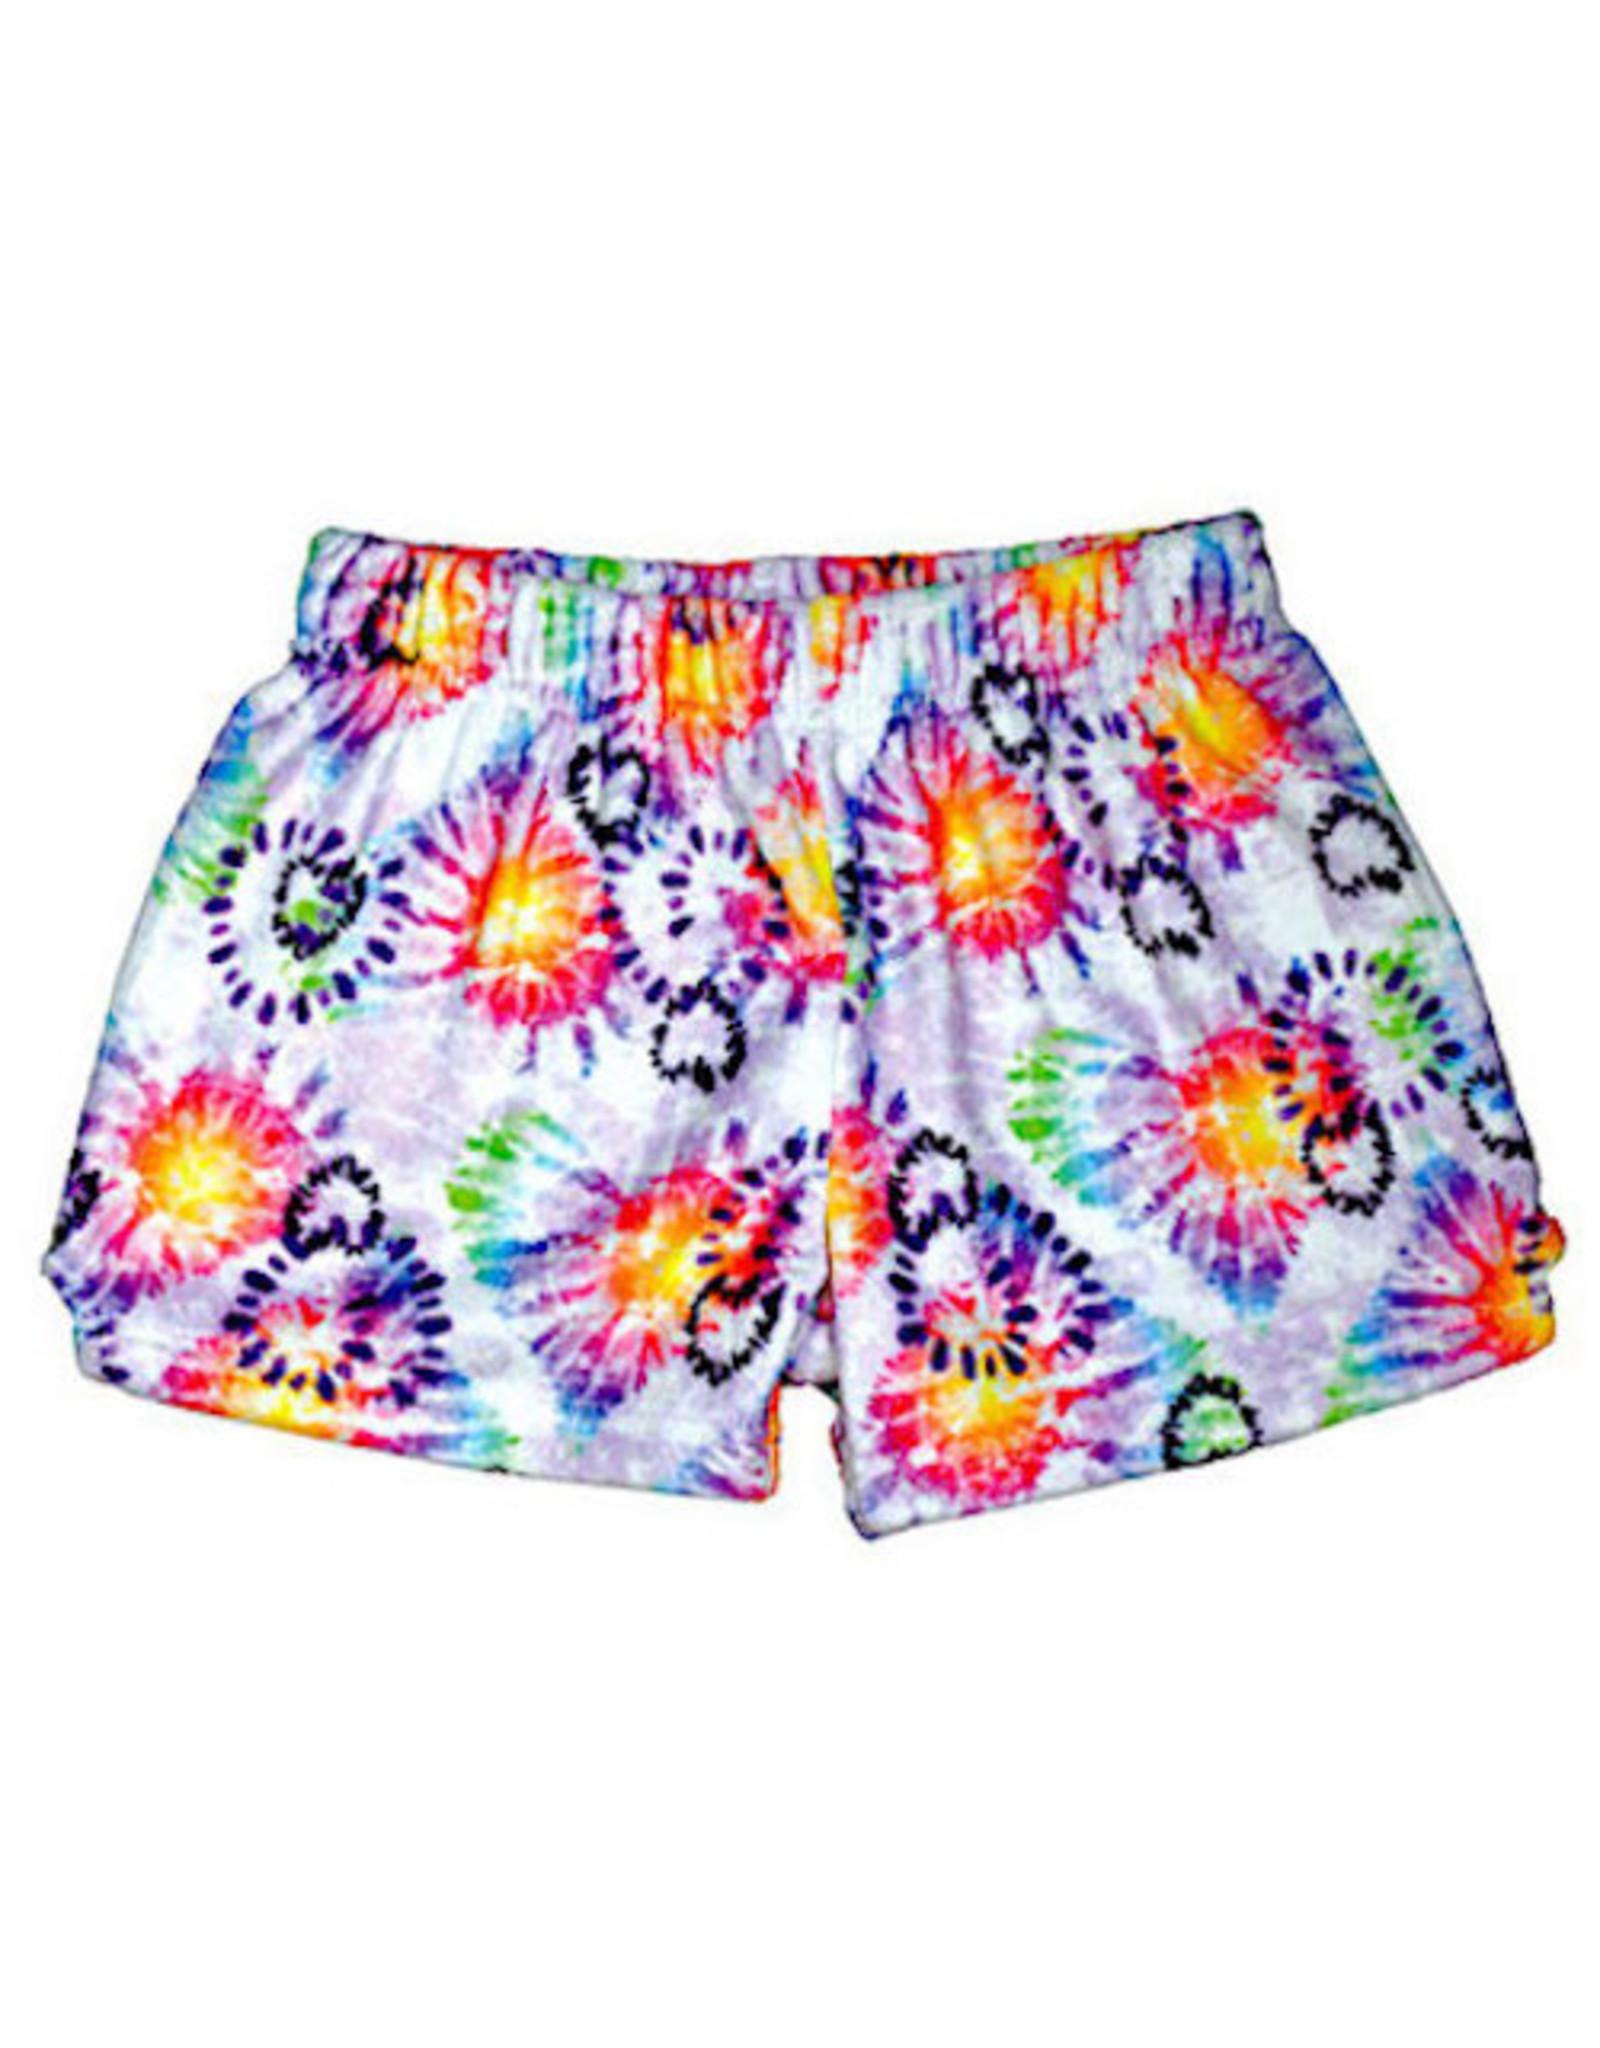 Iscream Heart Tie Dye Shorts